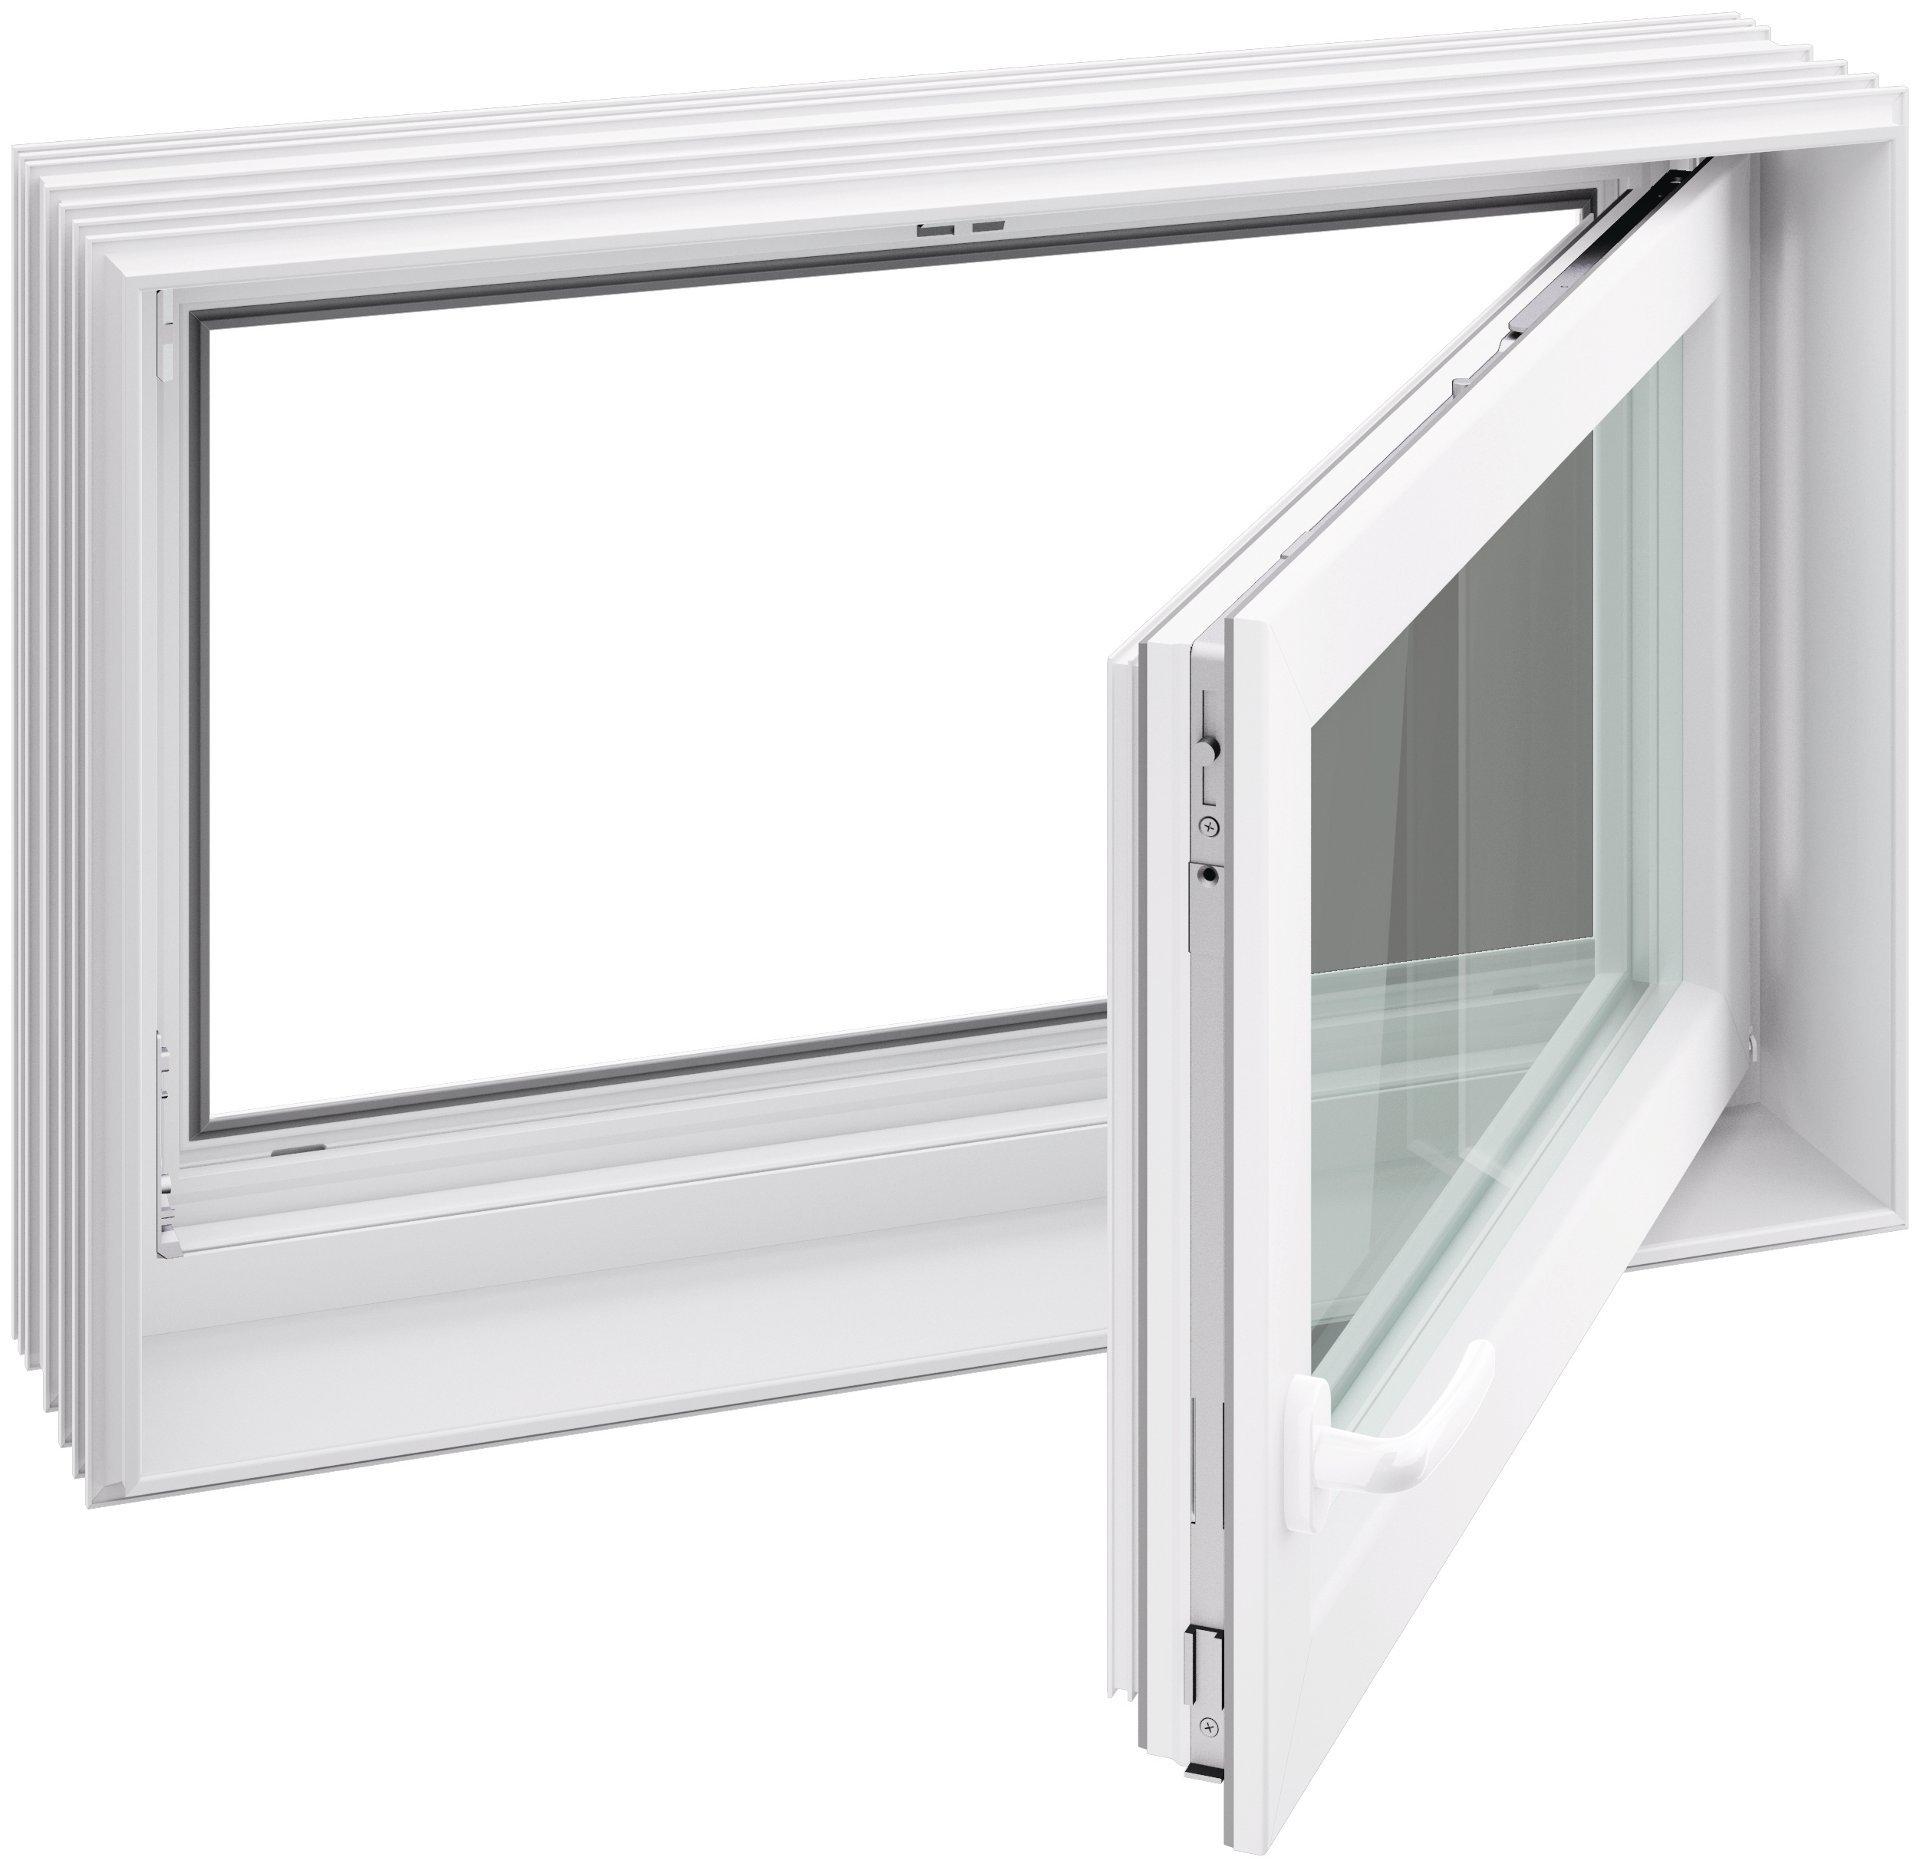 Aco Therm Kellerfenster